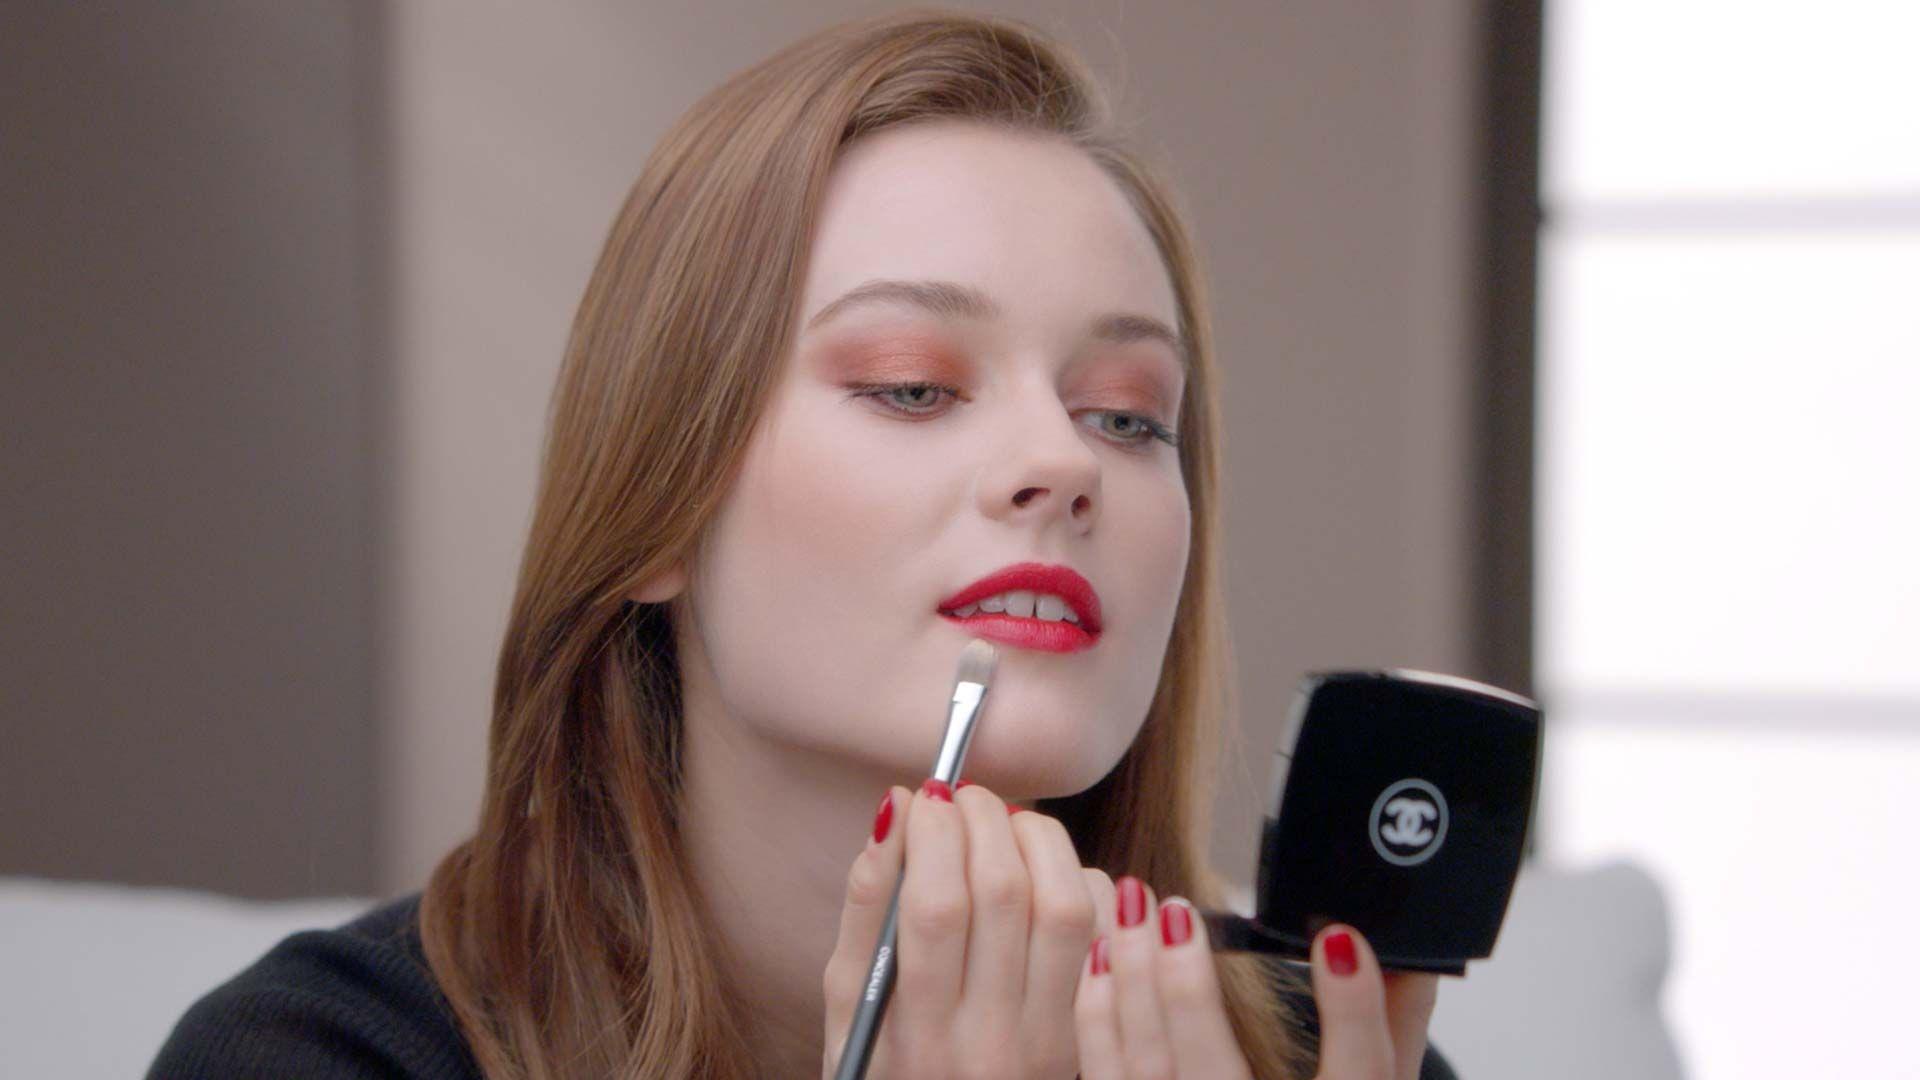 Jac jagaciak chanel fall 2015 le rouge makeup collection n1 chanel makeup tutorials a harmony of eye looks for the season baditri Images